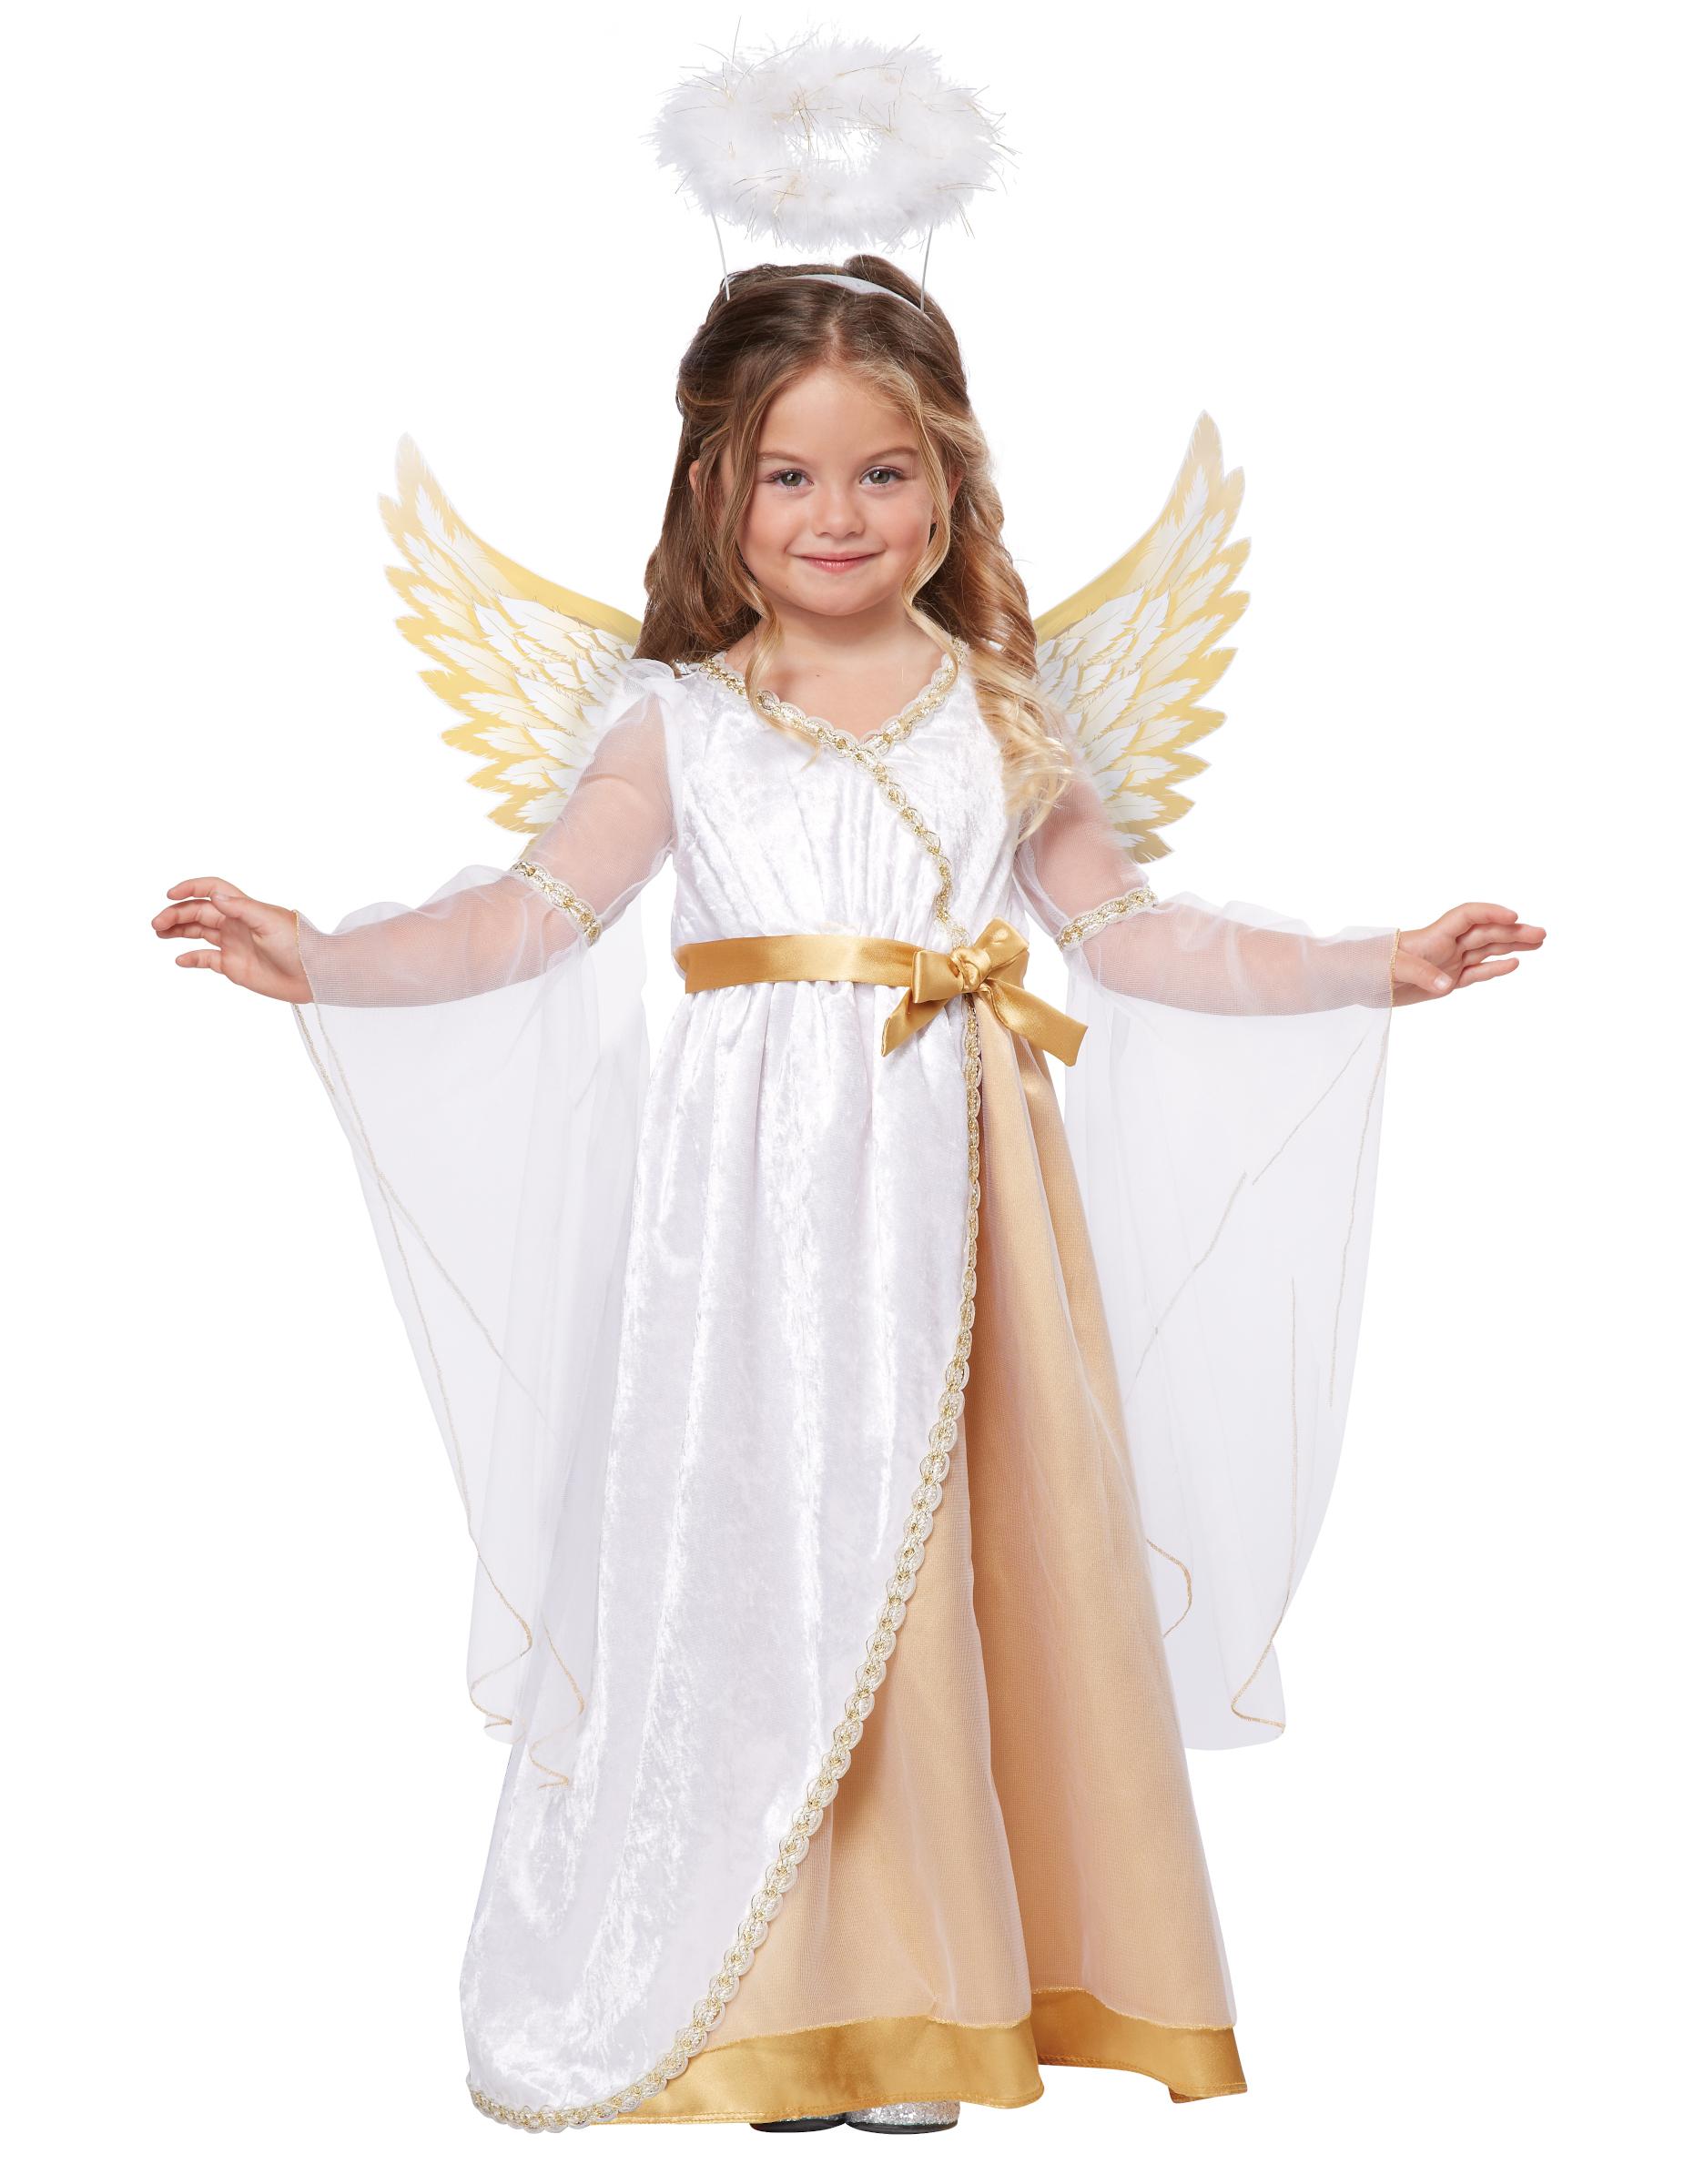 Engel Kostum Fur Kinder Krippenspiel Kostum Fasching Kostum 3